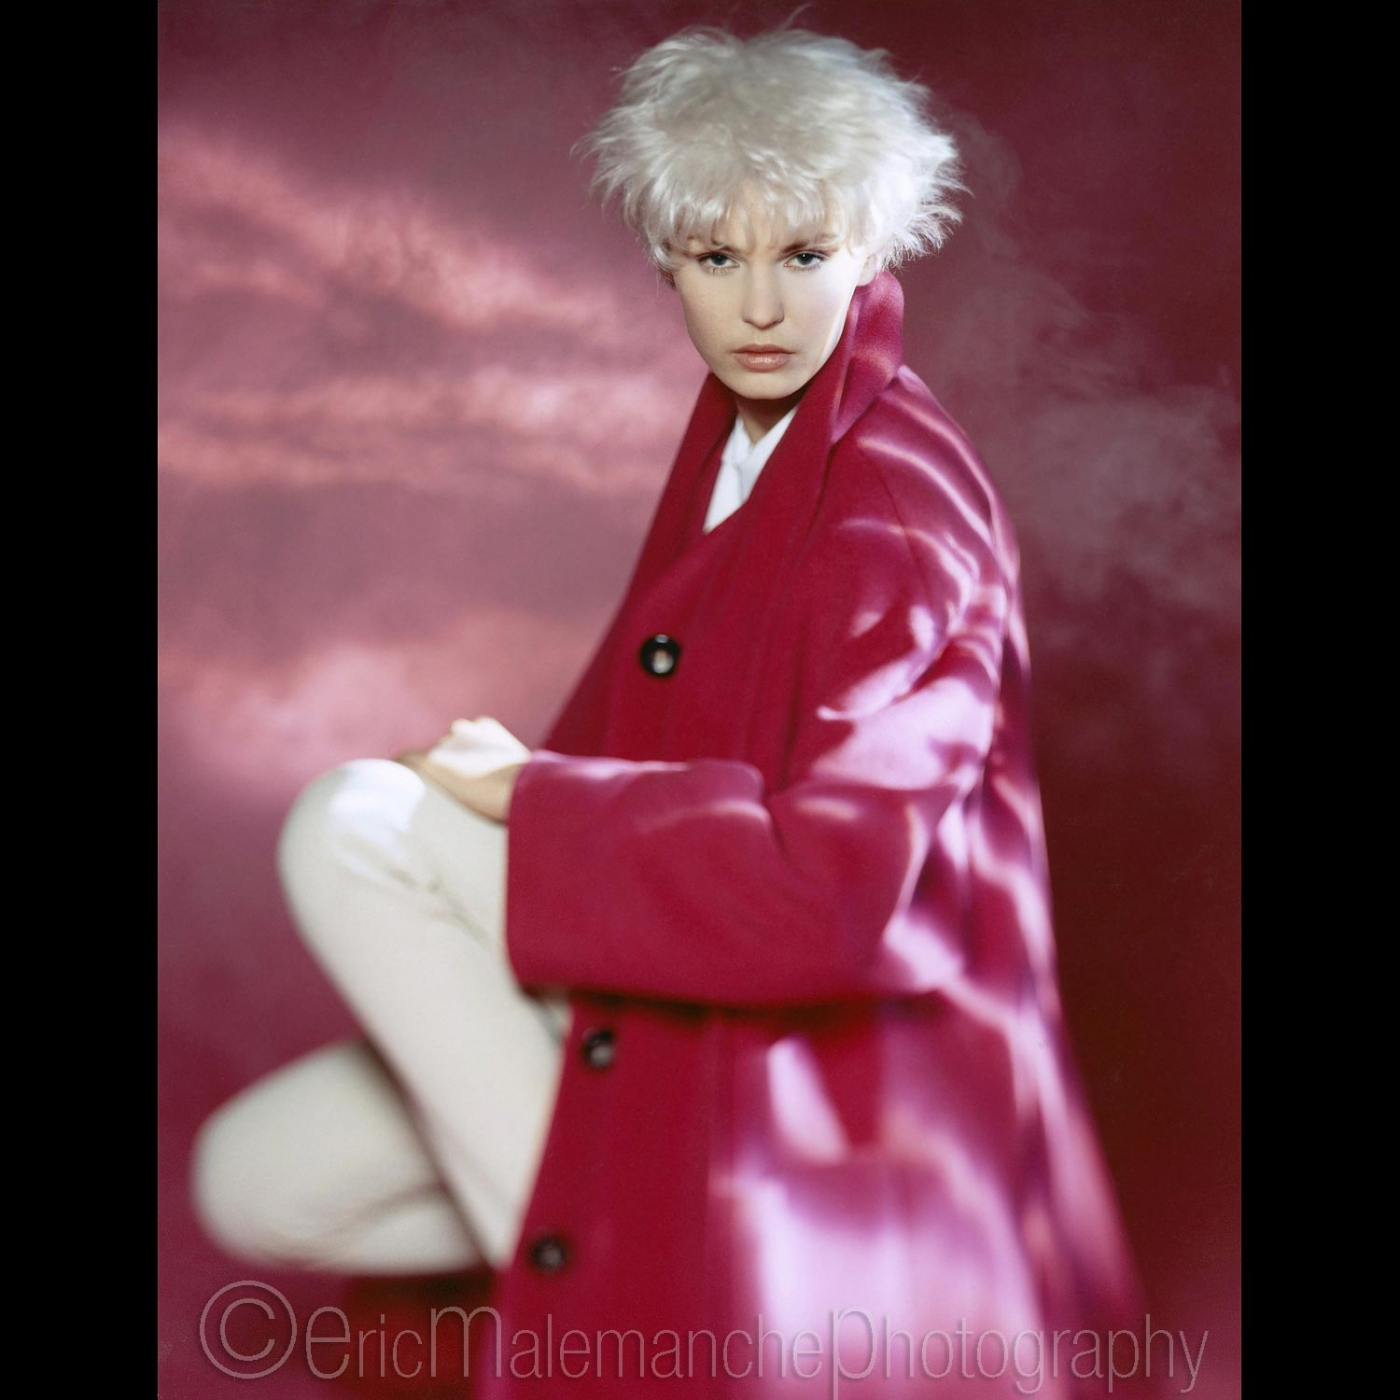 http://www.ericmalemanche.com/imagess/topics/fashion-90-s/liste/Fashion-Zapa-Pink.jpg